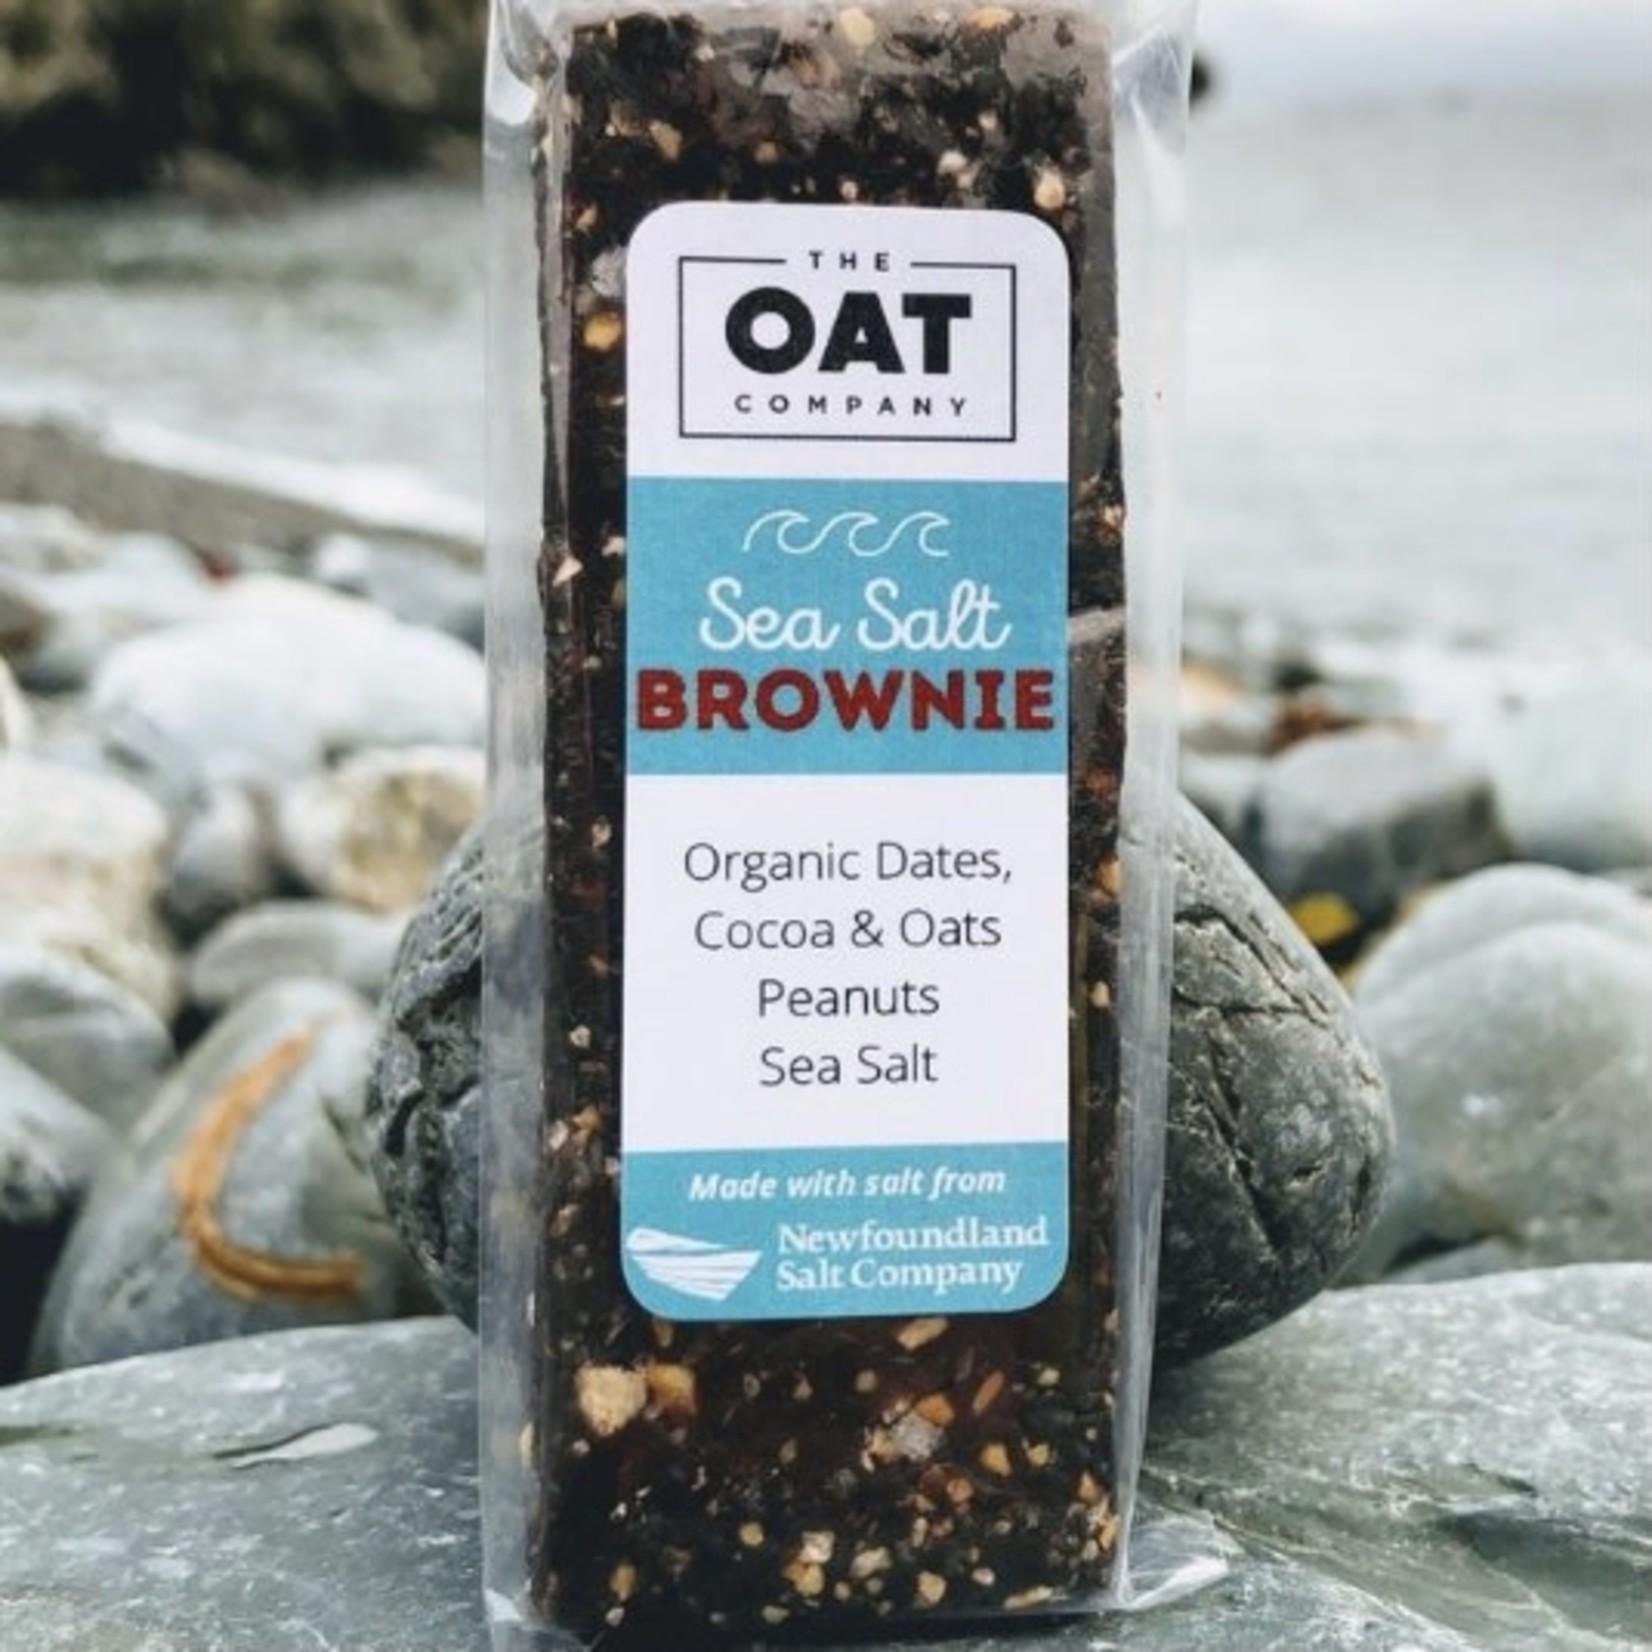 The Oat Company The Oat Company Sea Salt Brownie Bar